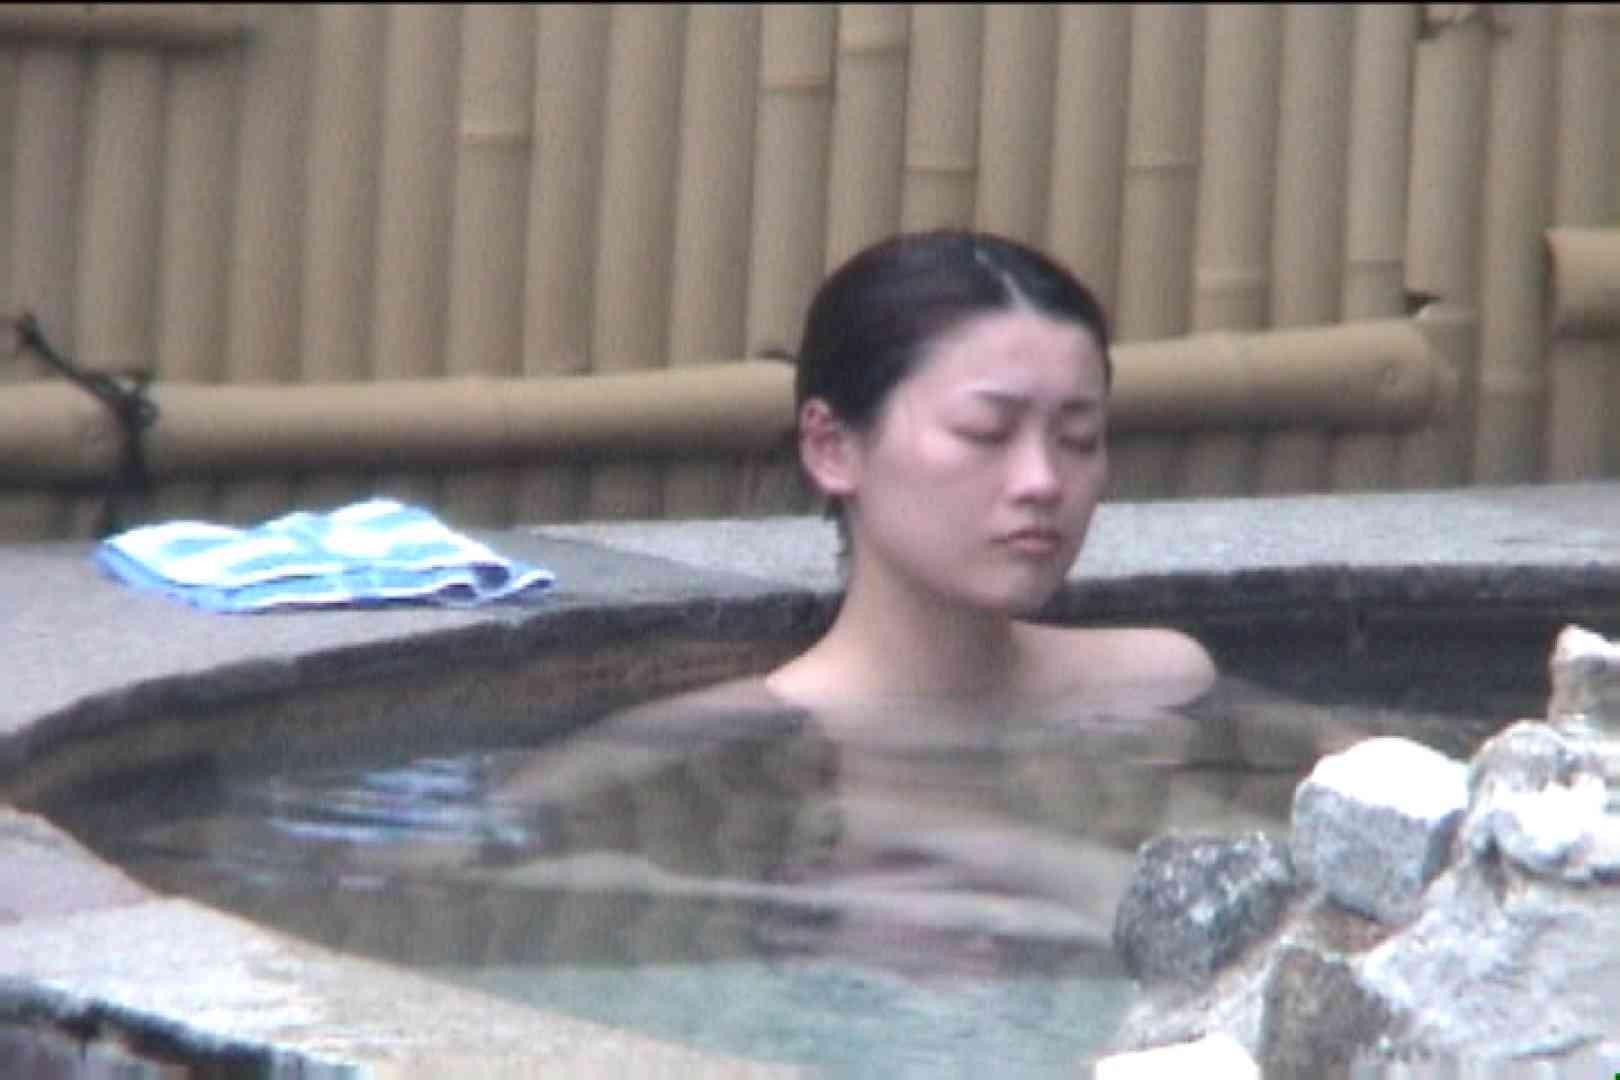 Aquaな露天風呂Vol.92【VIP限定】 露天風呂 盗撮動画紹介 33連発 26